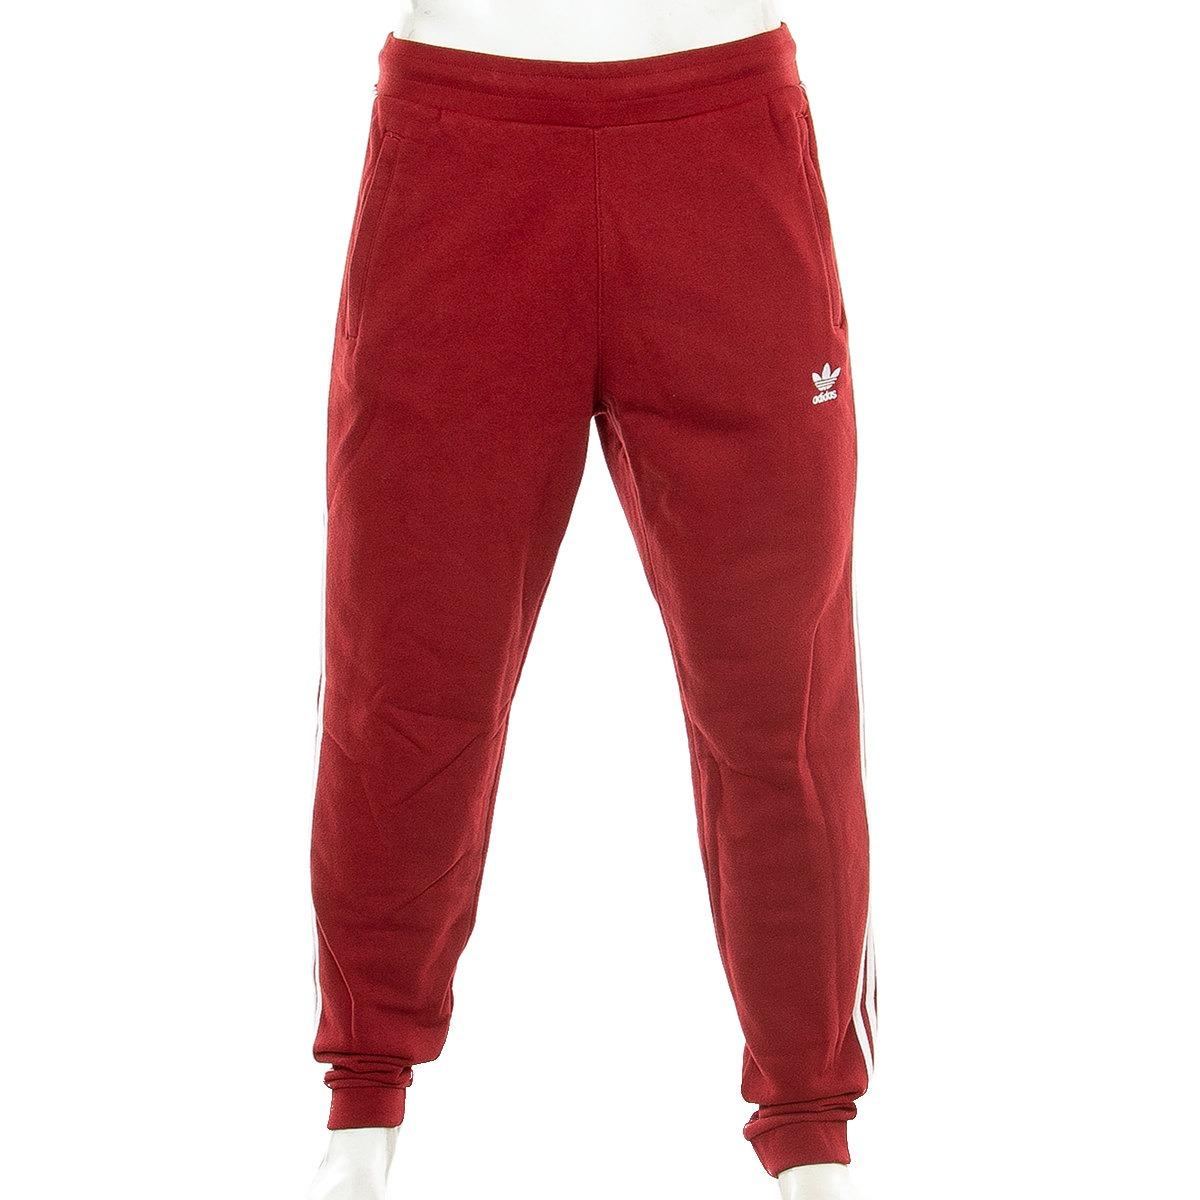 00 Tiras Adidas 3 789 Tienda En Originals Pantalón Oficial 5q06dxZ0n